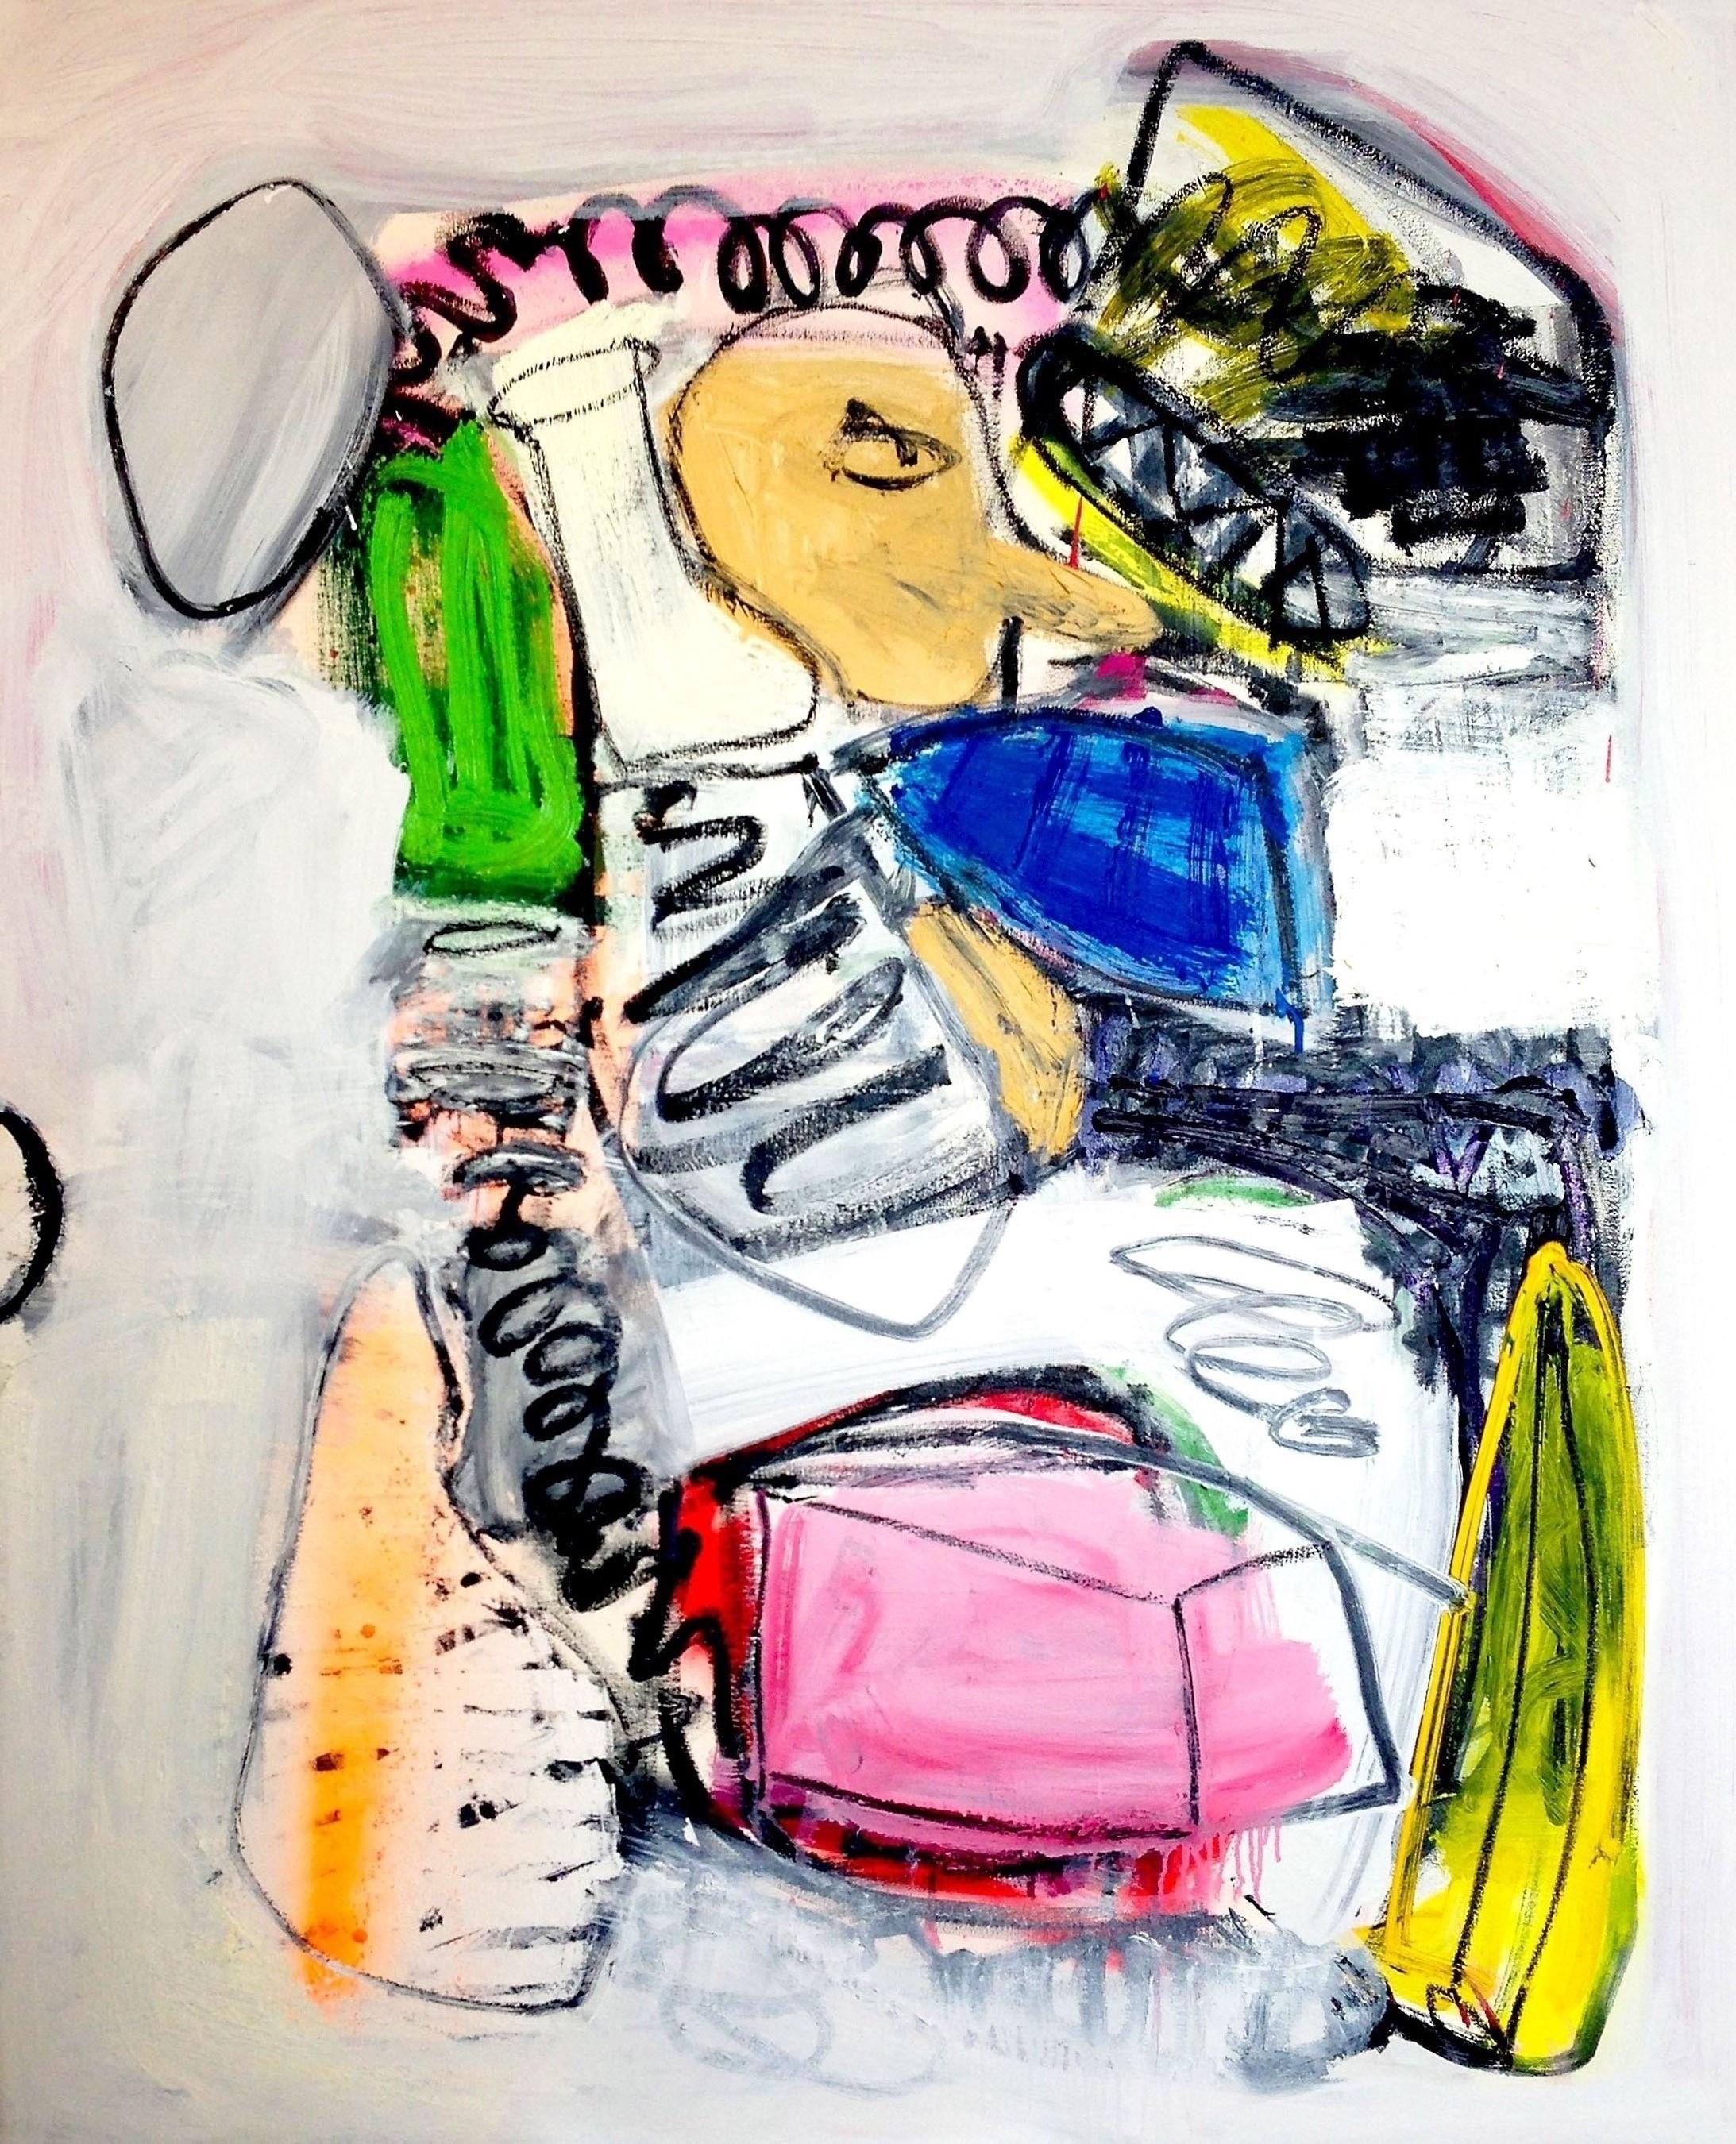 Corrigan_Jampandy_32x46_oil on canvas.jpg